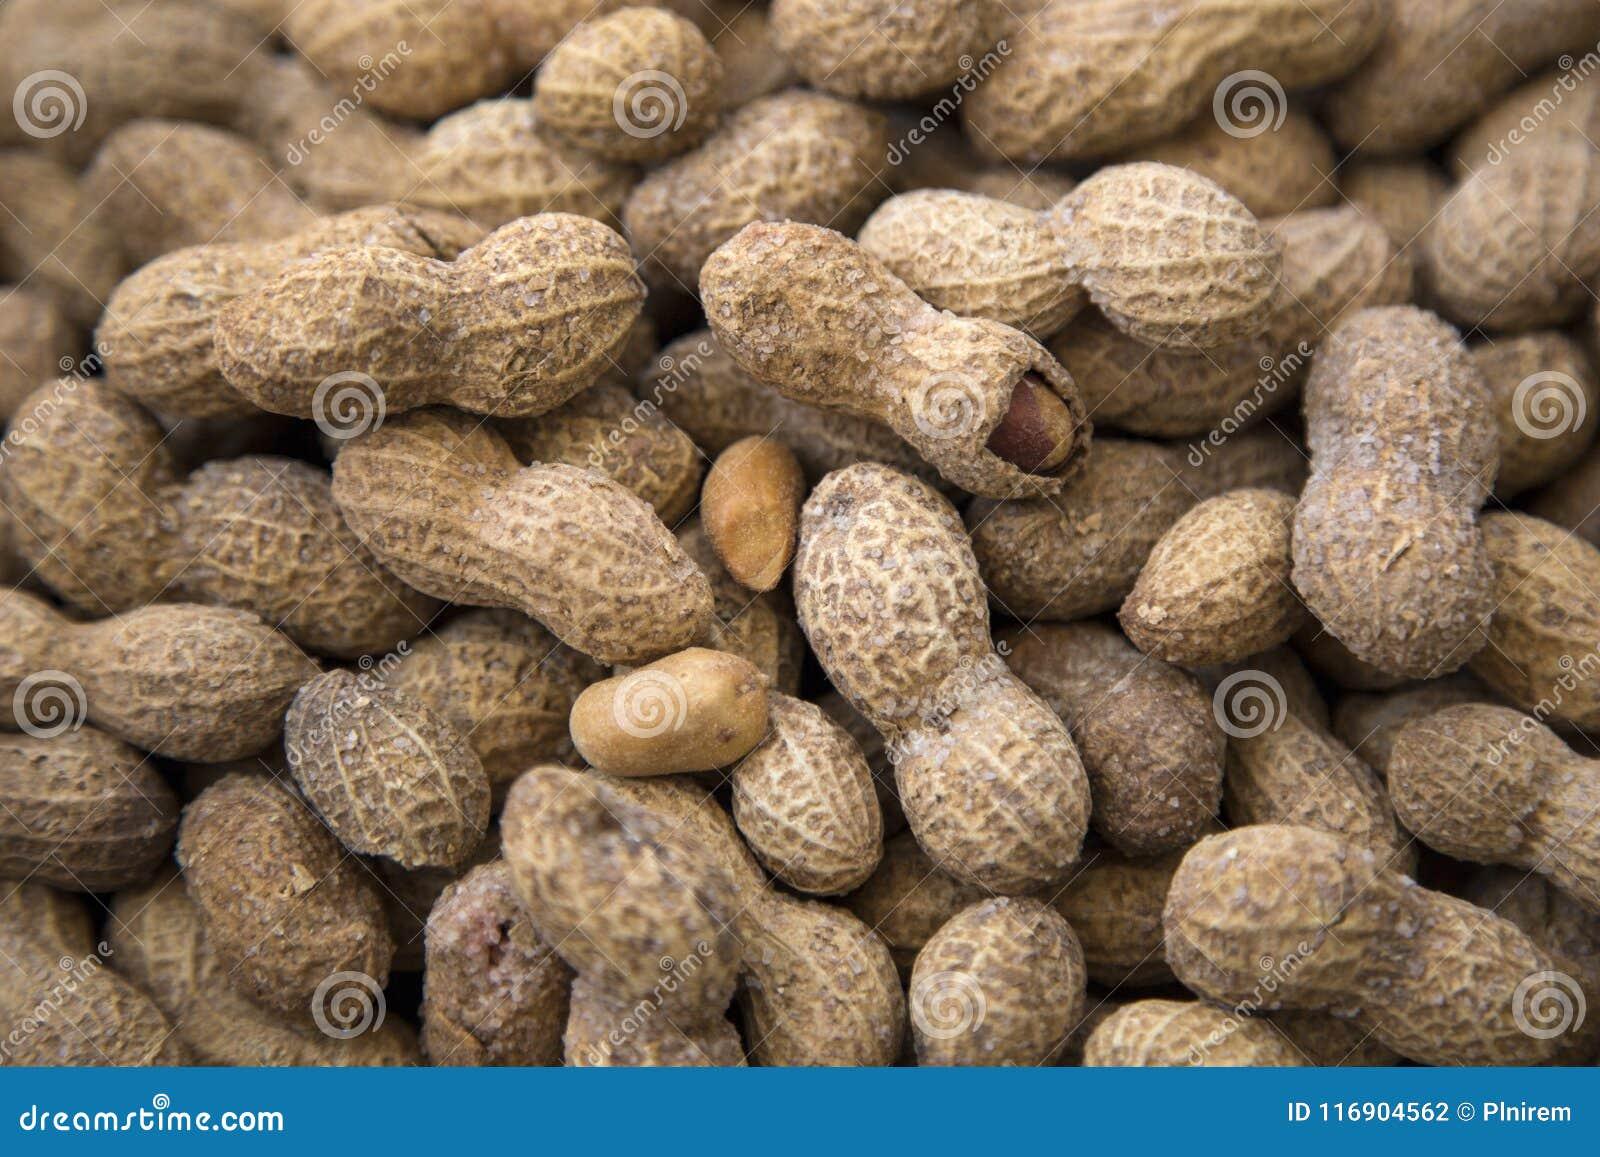 Arachidi o arachide salate